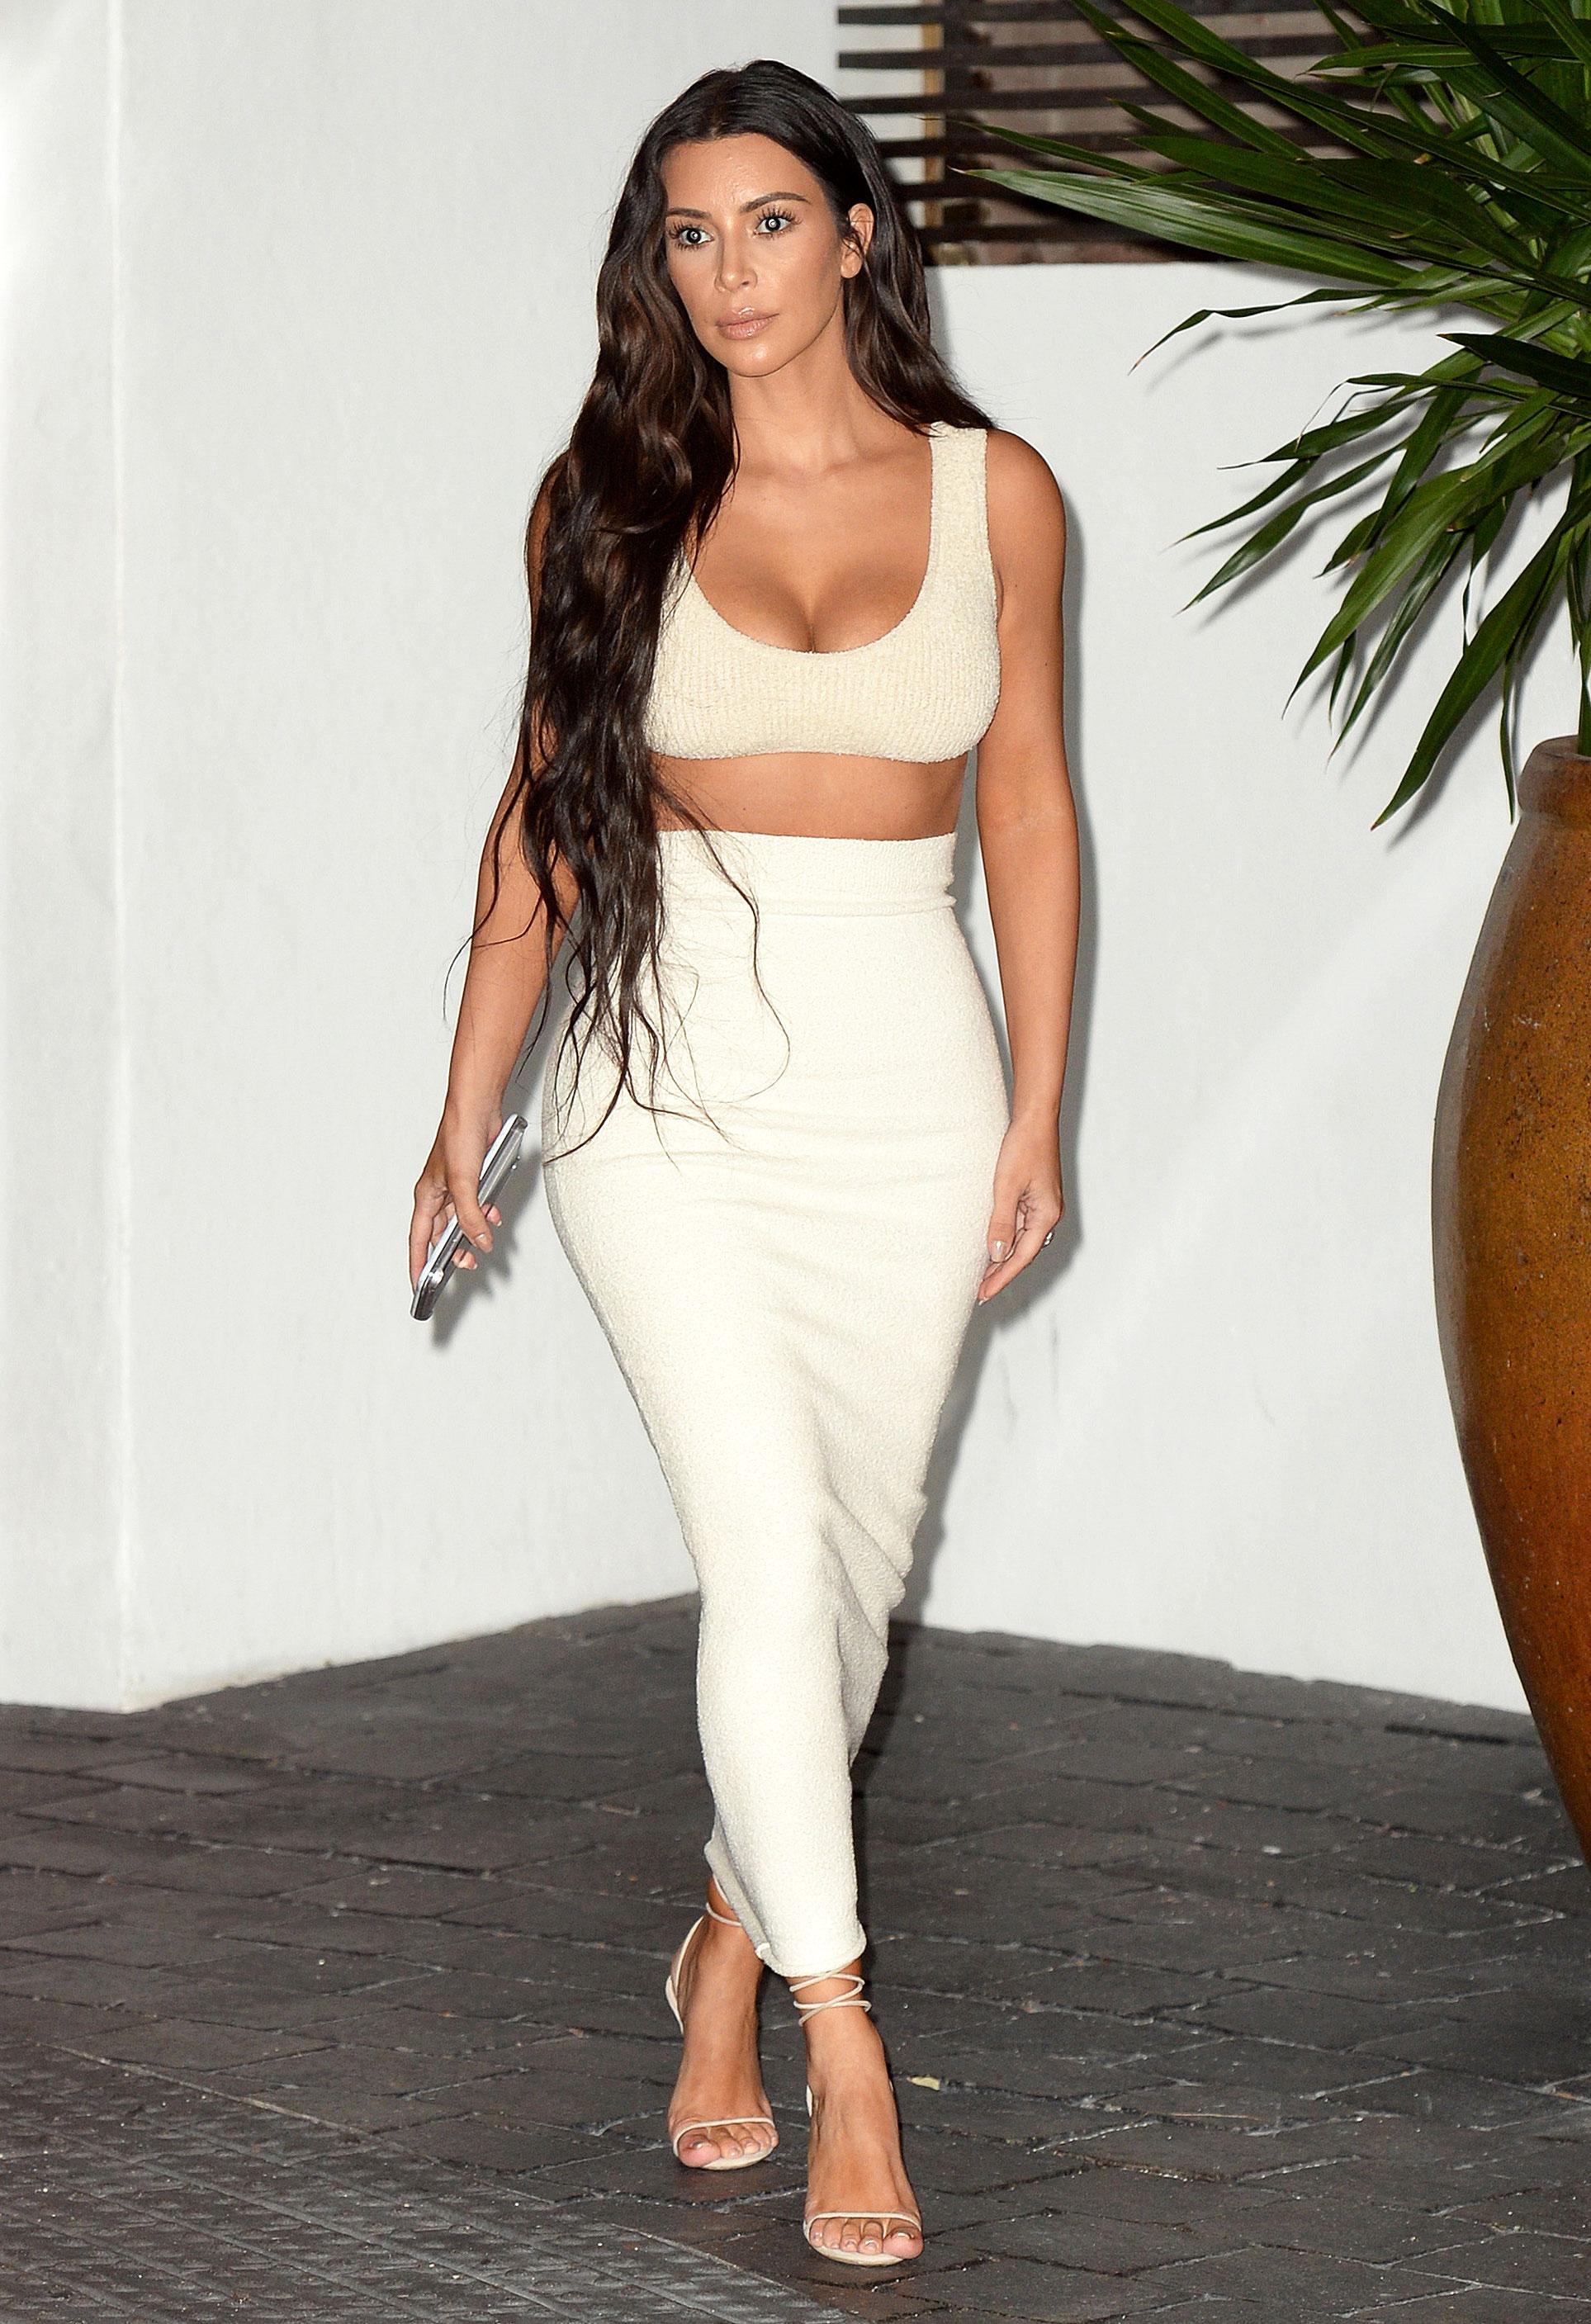 Kim Kardashian in Tight Dress - Leaving A Business Meeting